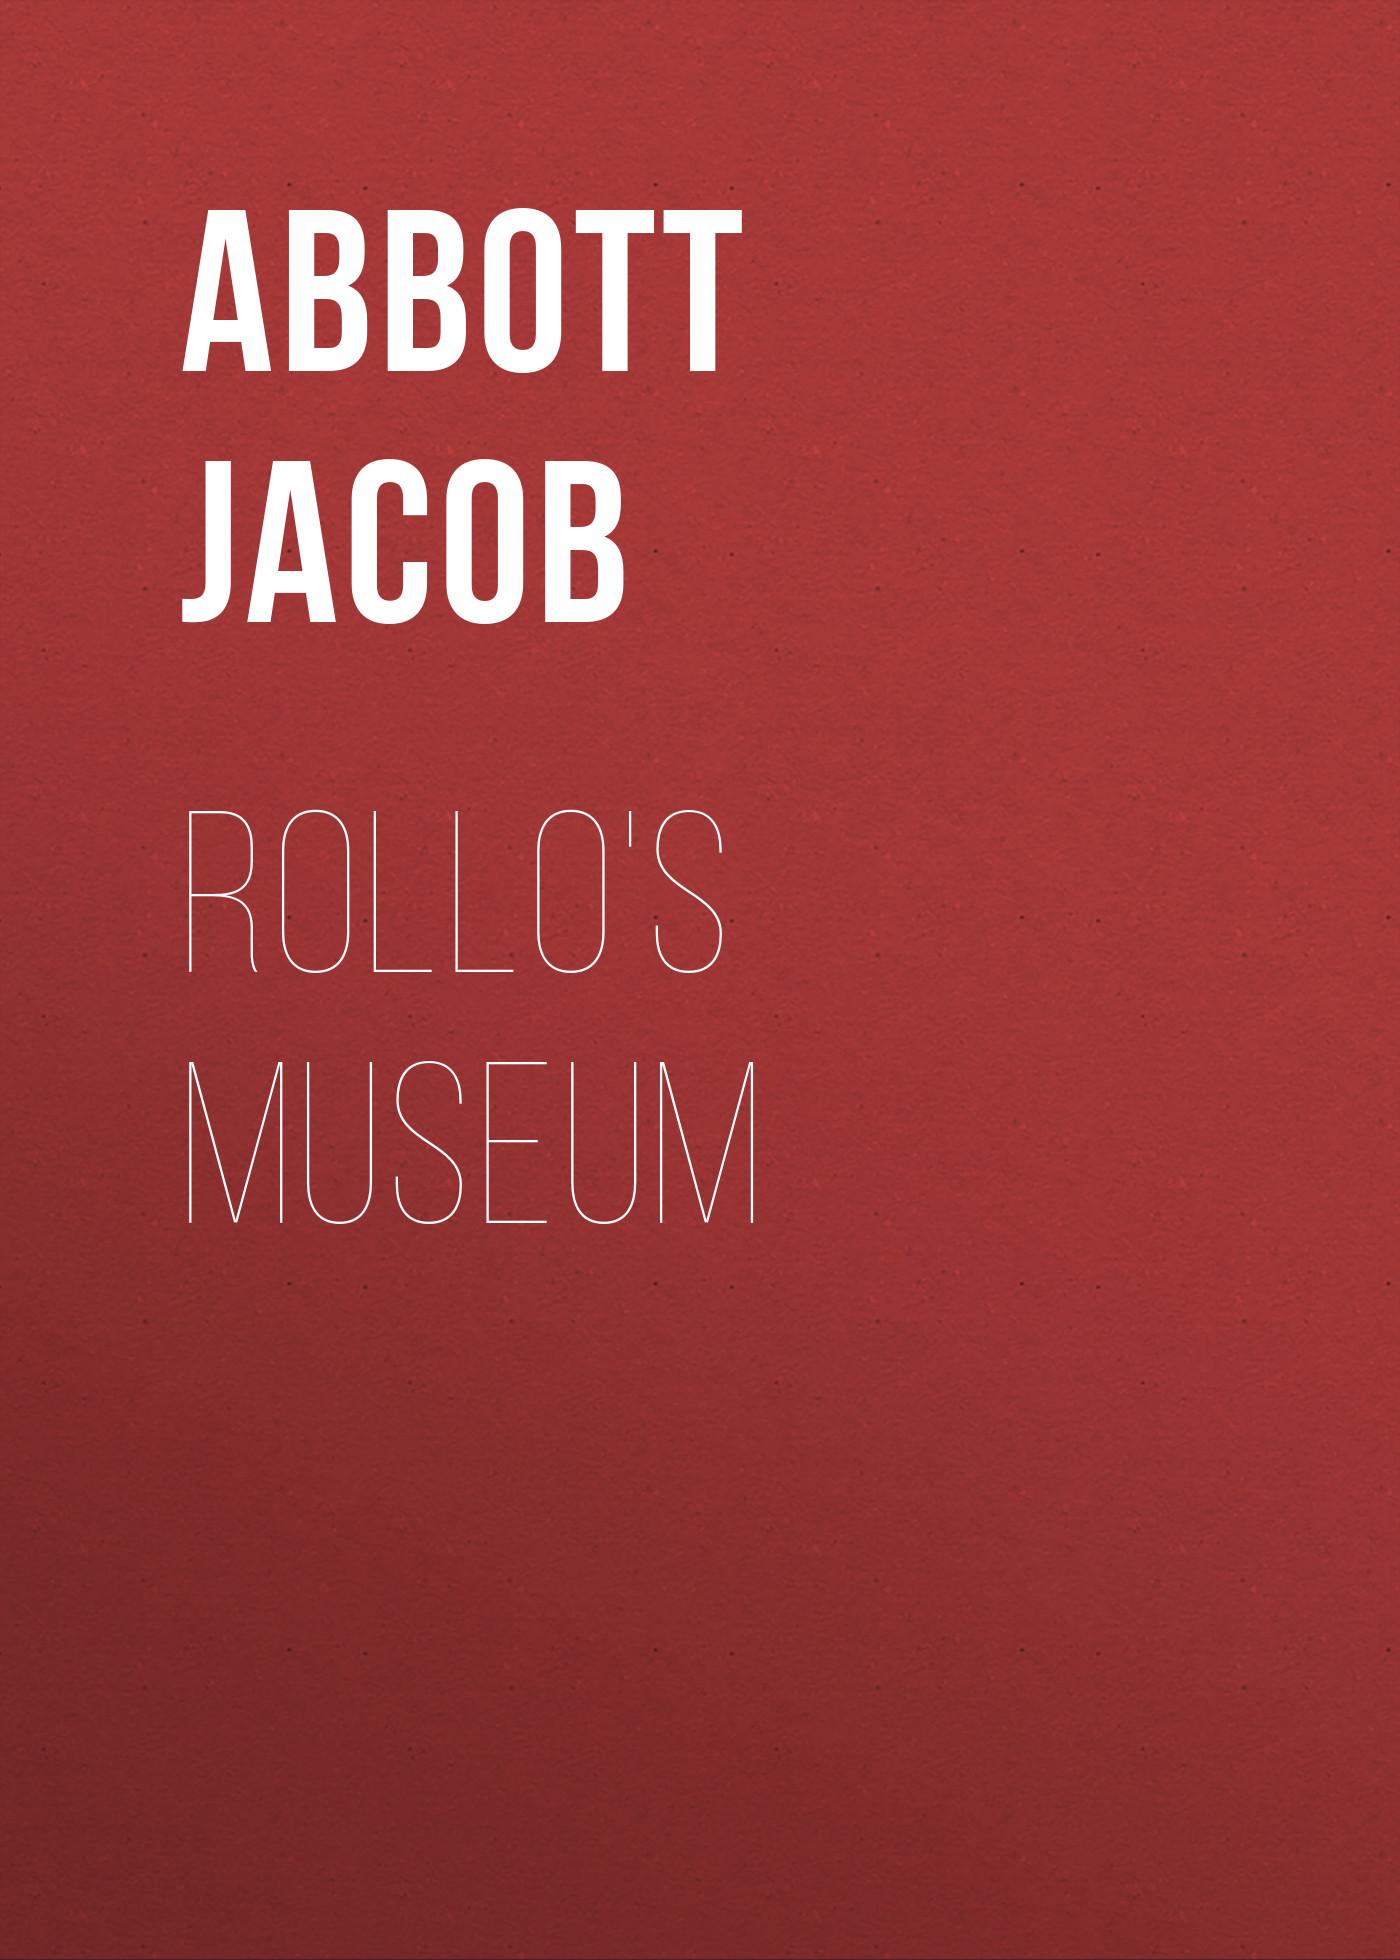 Abbott Jacob Rollo's Museum